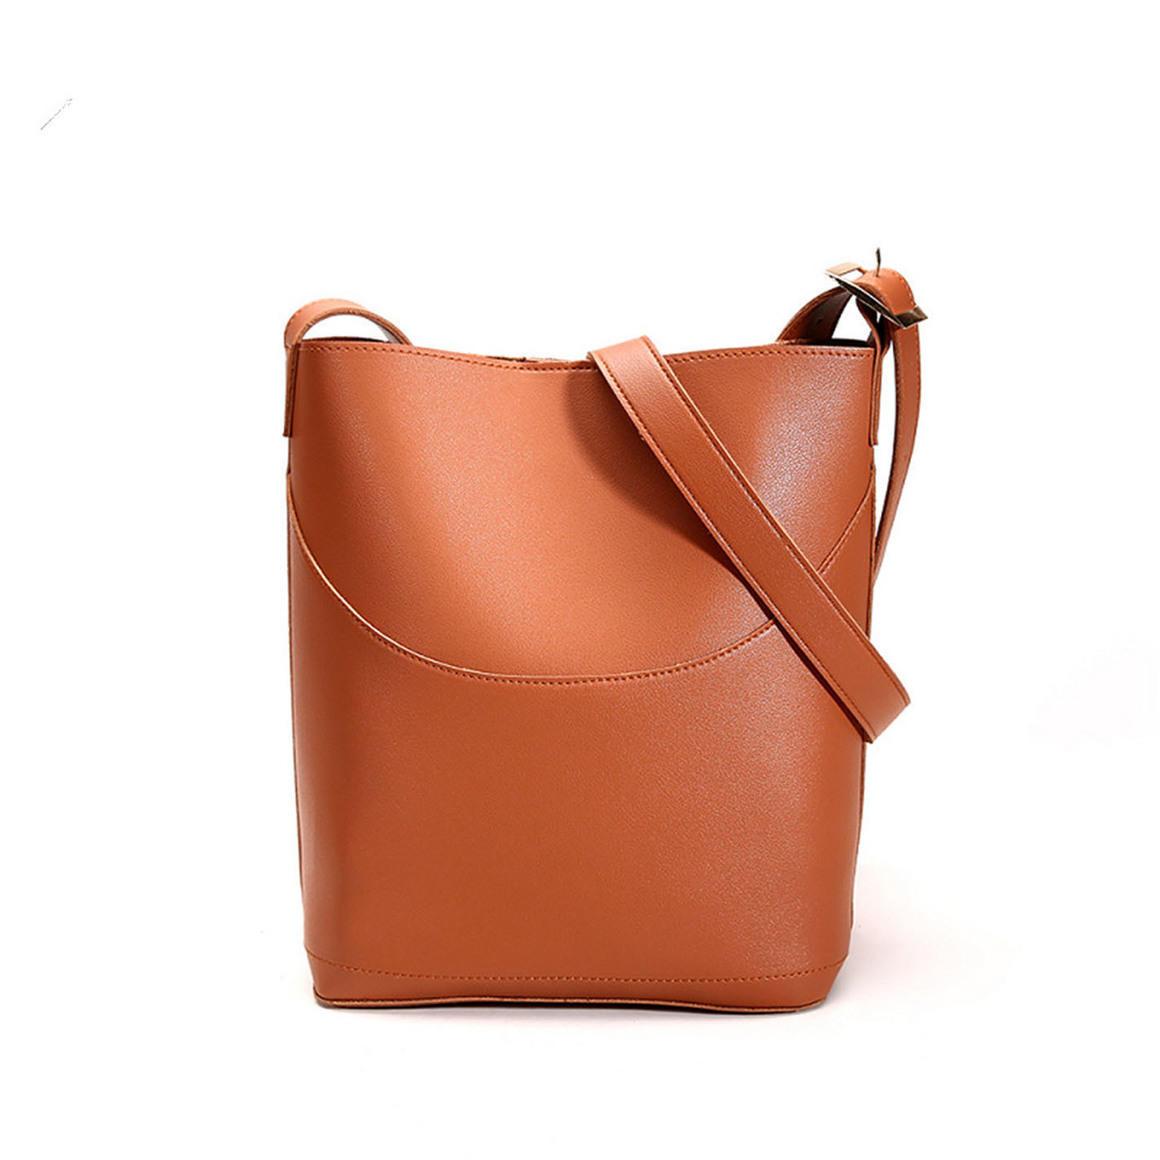 THSB1012: Tan: Eva Bucket Tote Bag | Trada Marketplace